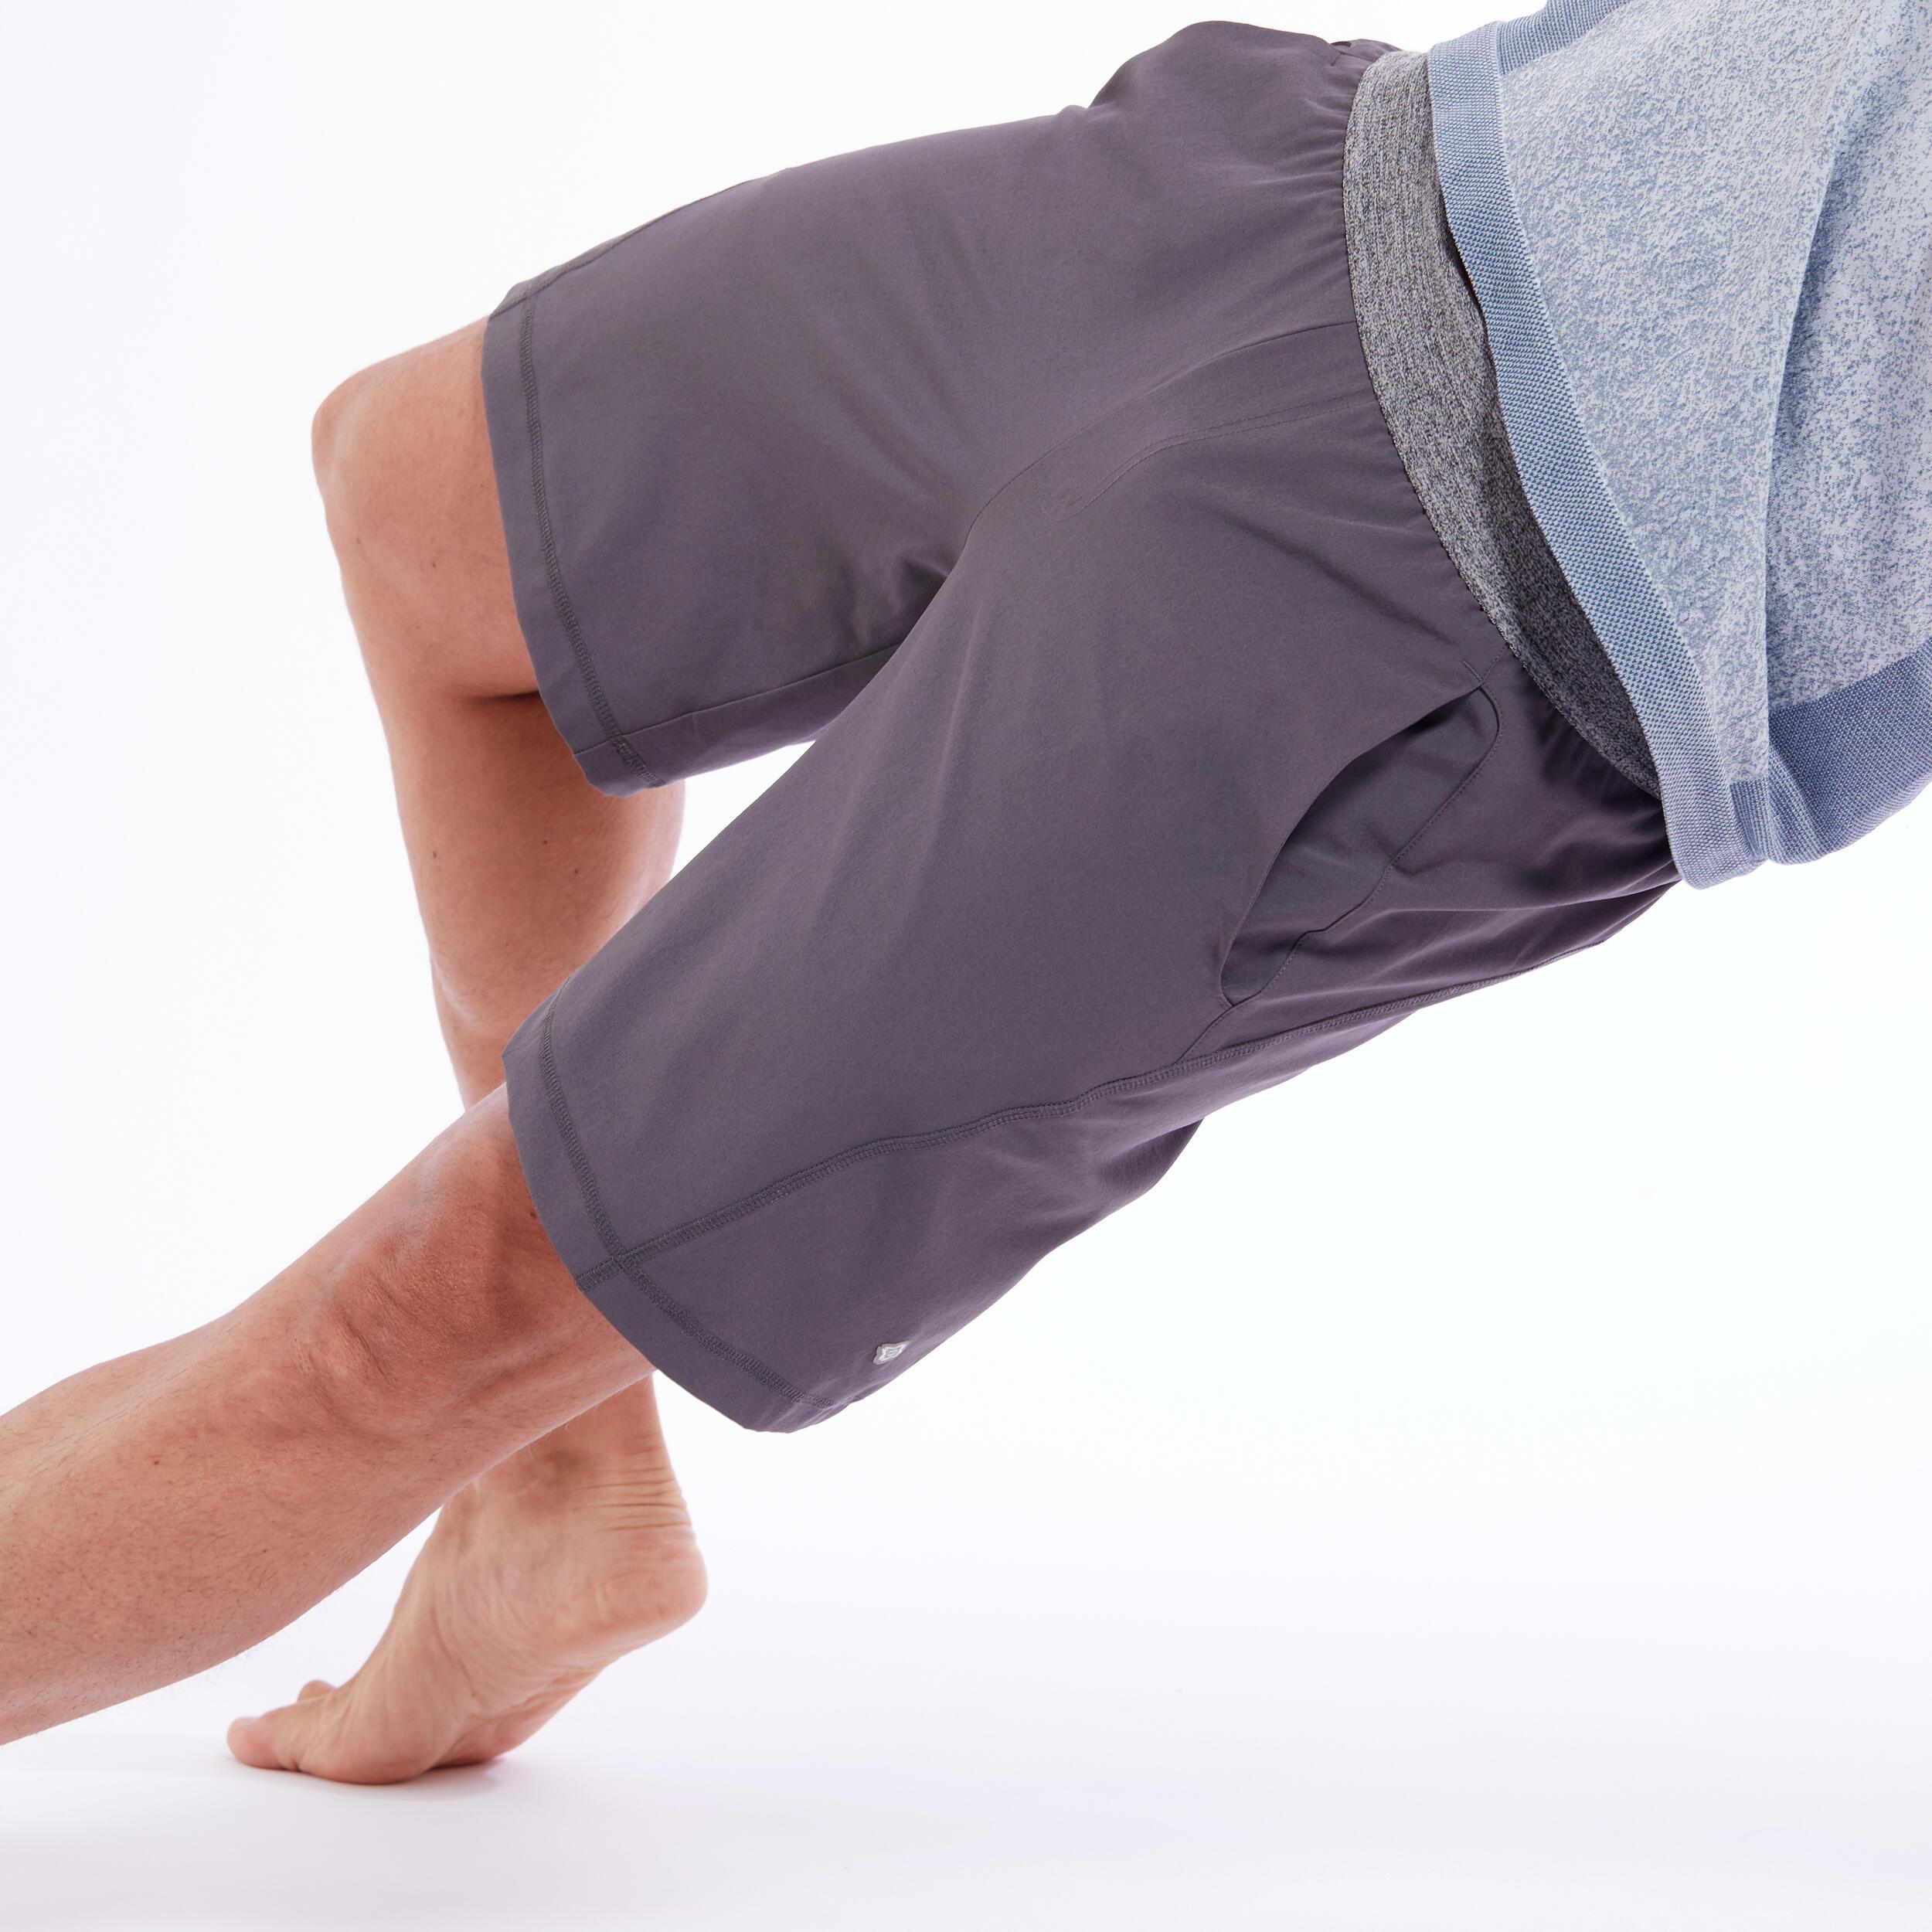 Șort Yoga gri bărbați la Reducere poza